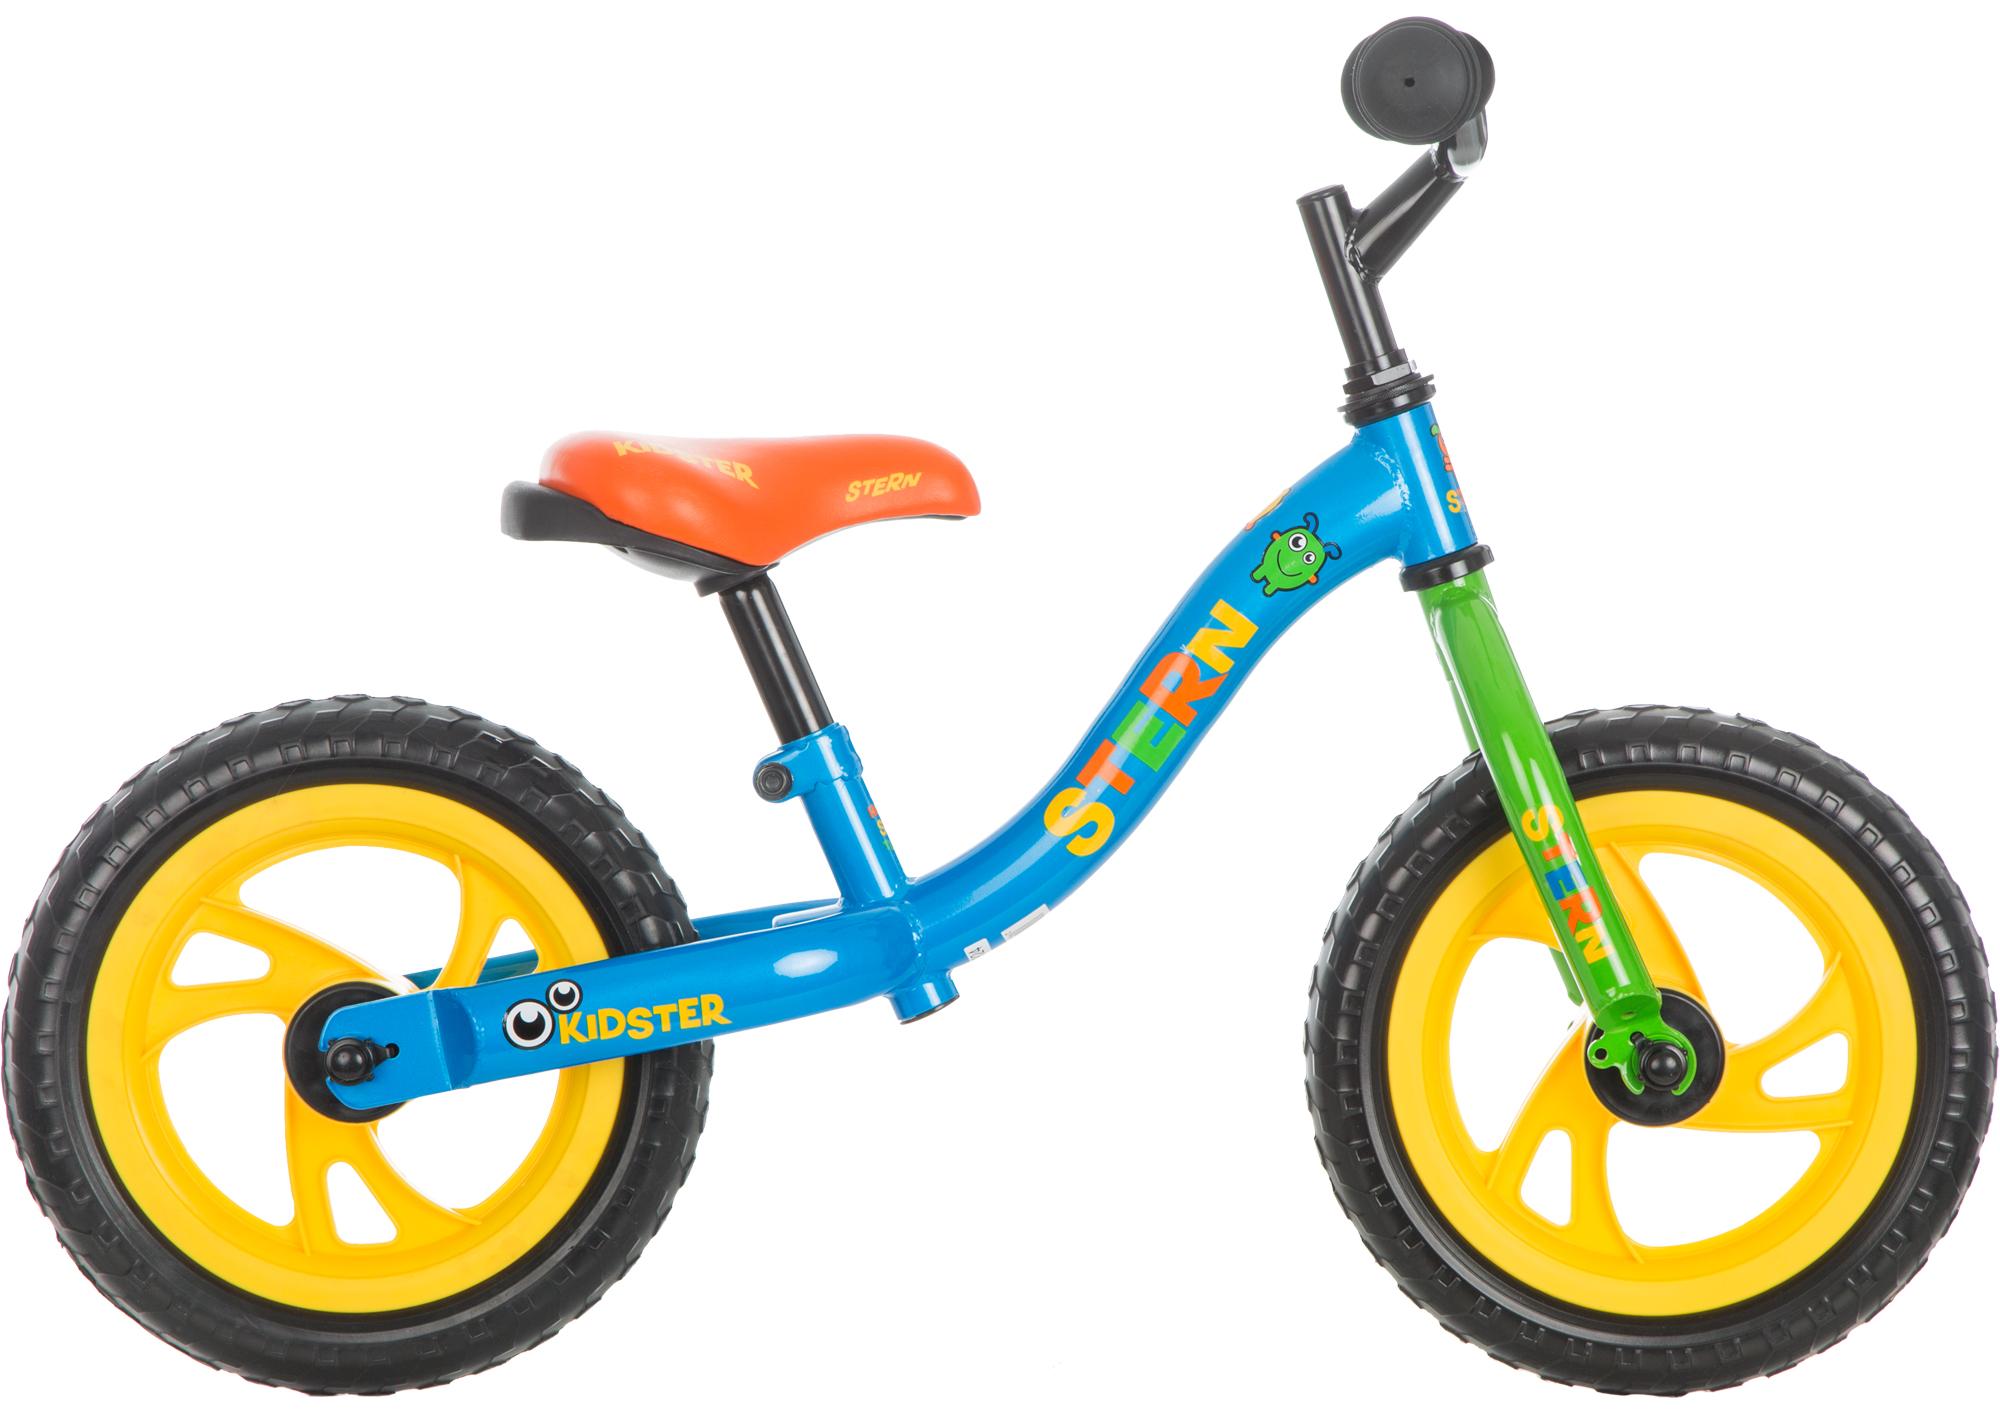 Stern Stern Kidster Boy 12 (2017), размер 90-105